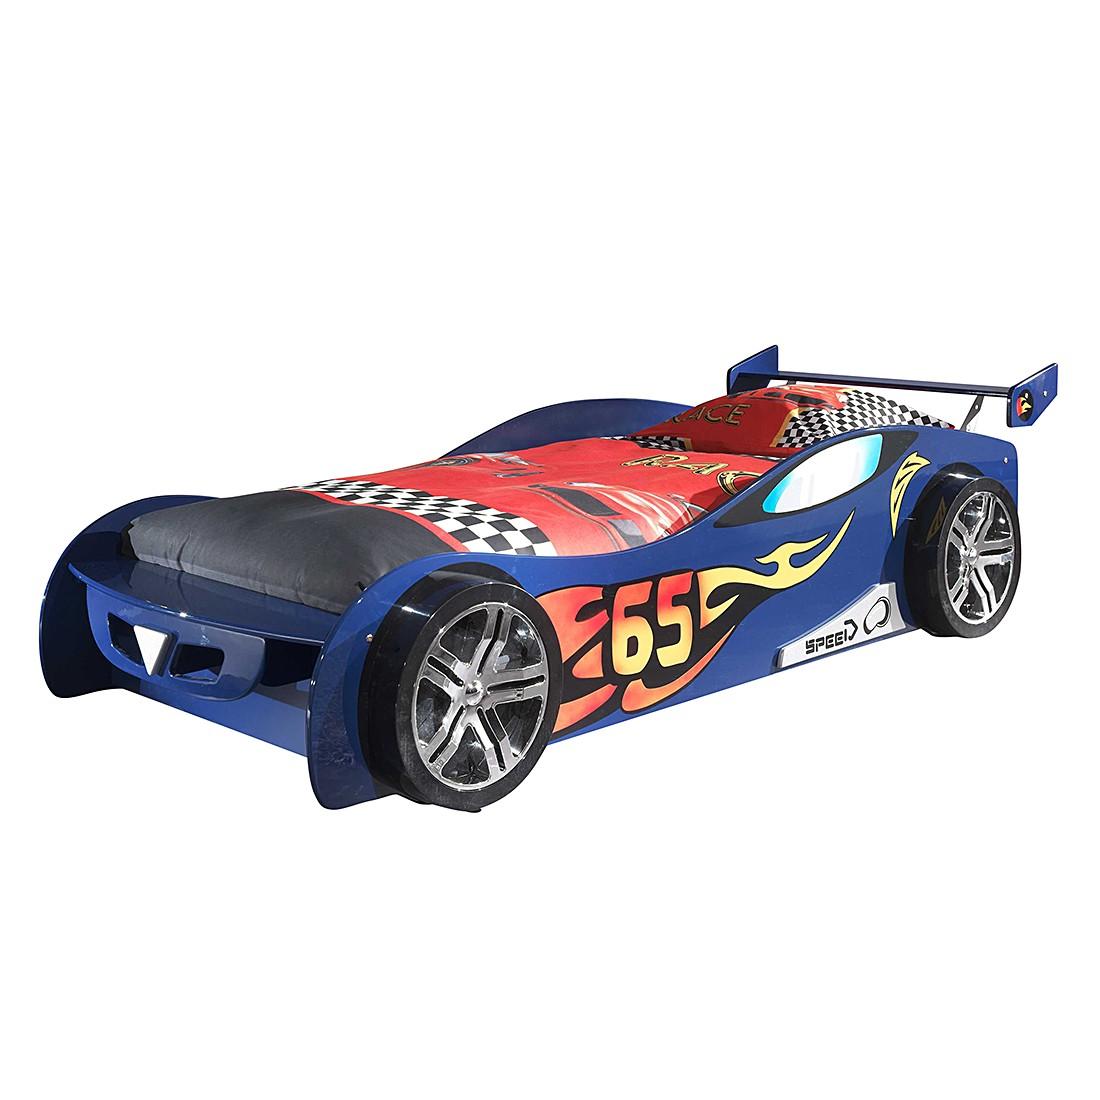 Autobett Le Mans – Blau, Vipack jetzt kaufen